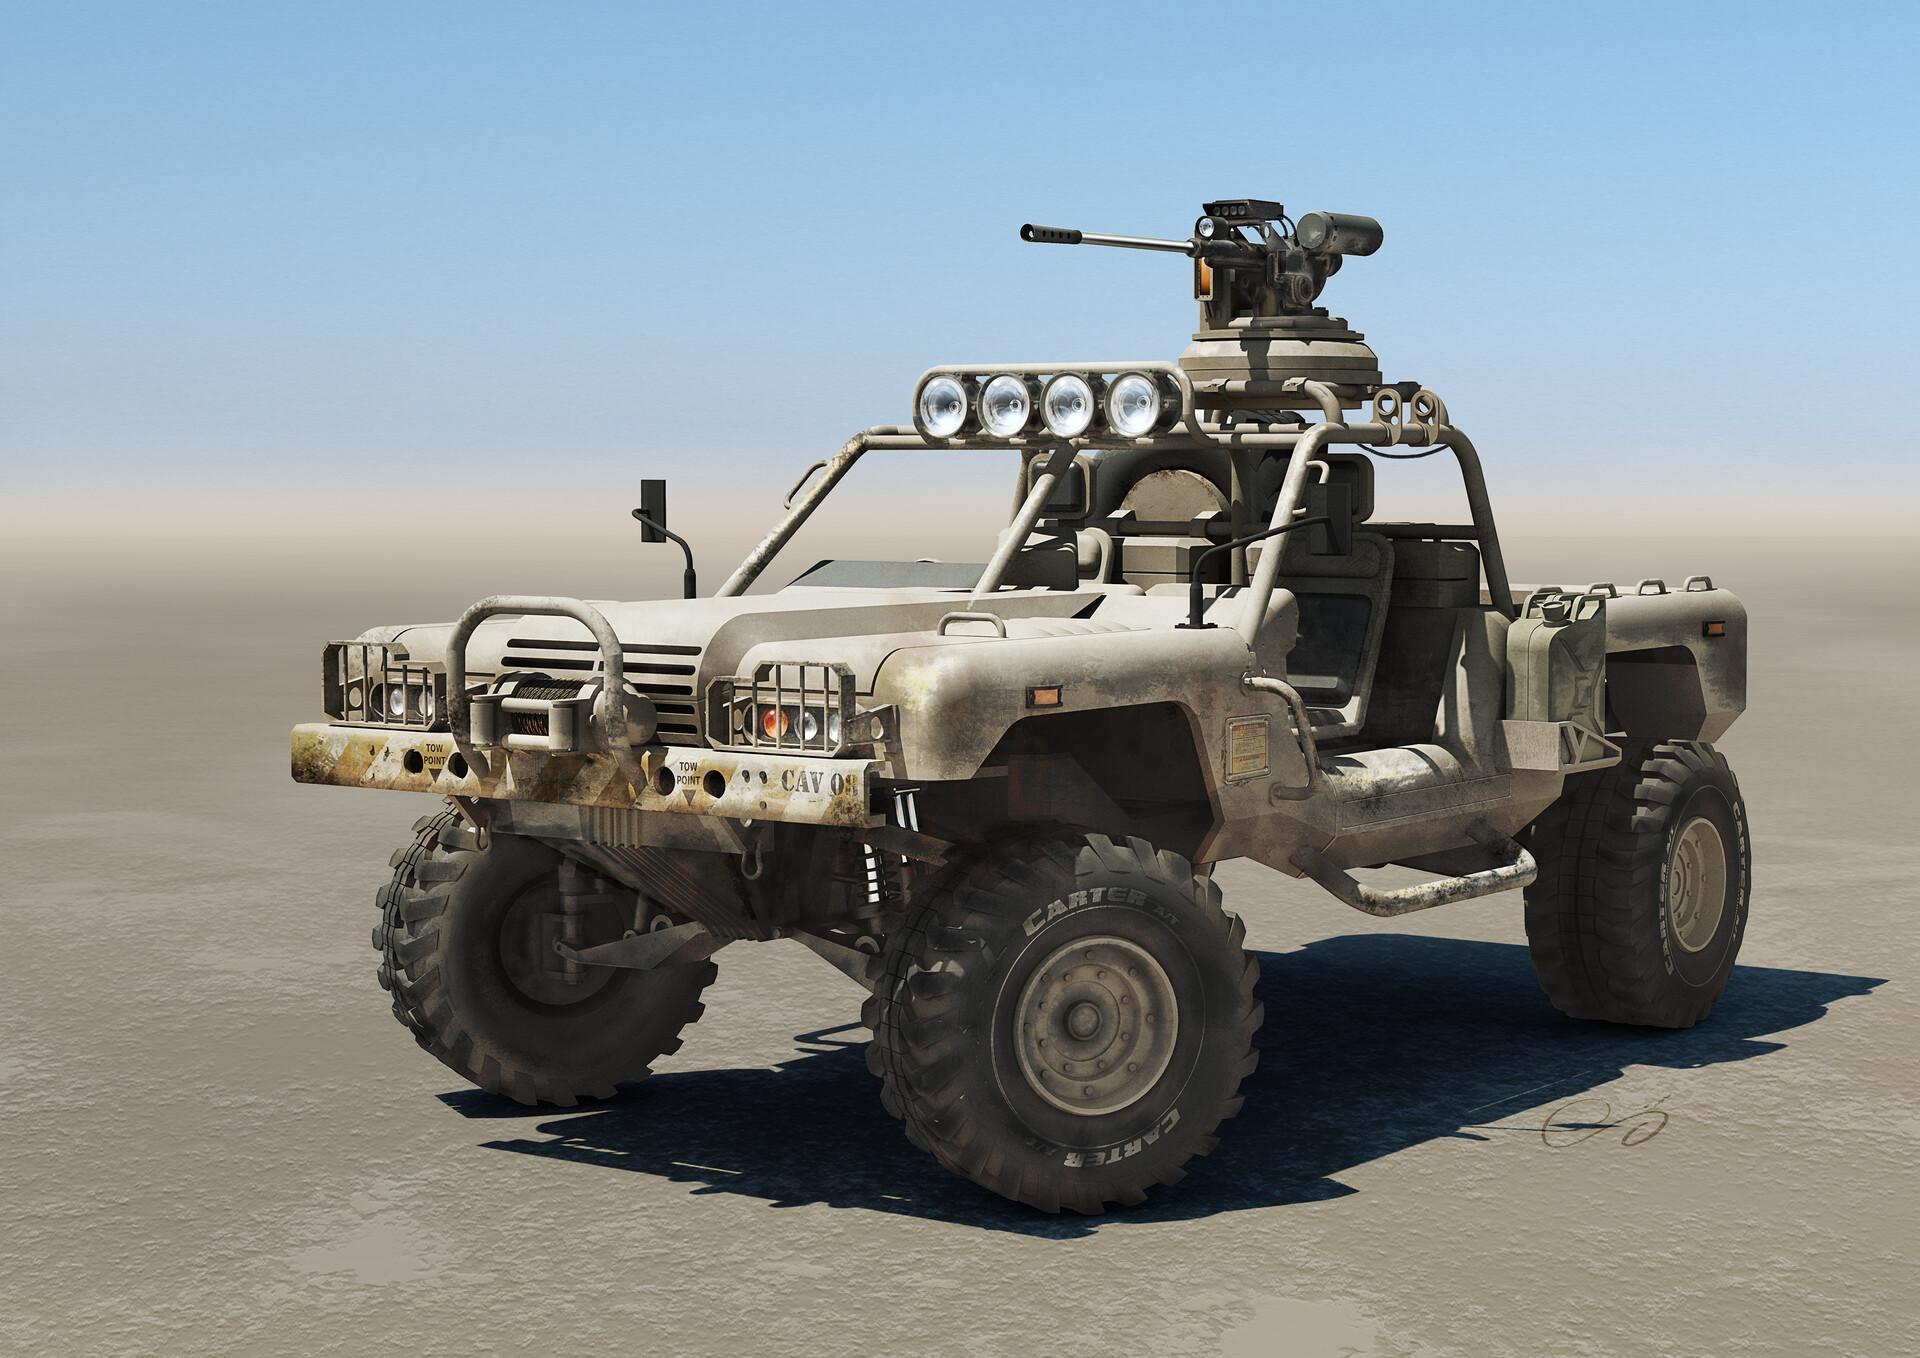 General Utility Tactical Transport (G.U.T.T.)